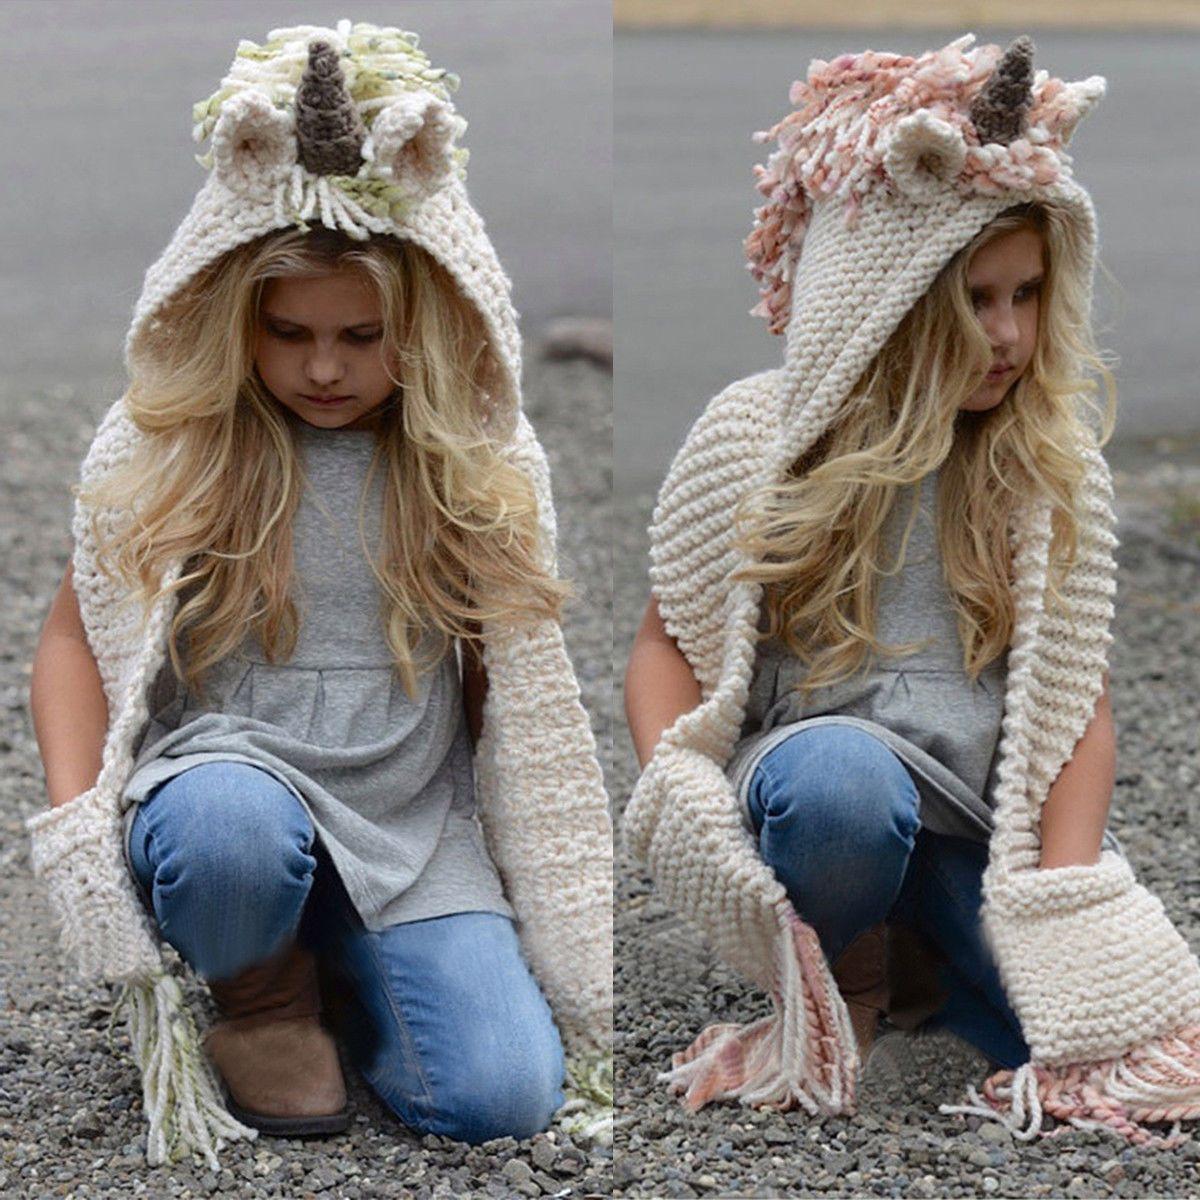 f9266f3f1fc  10.04 - Girls Crochet Knitting Unicorn Hooded Scarf Fox Hat Hoodie Animal  Chunky Beanie  ebay  Fashion